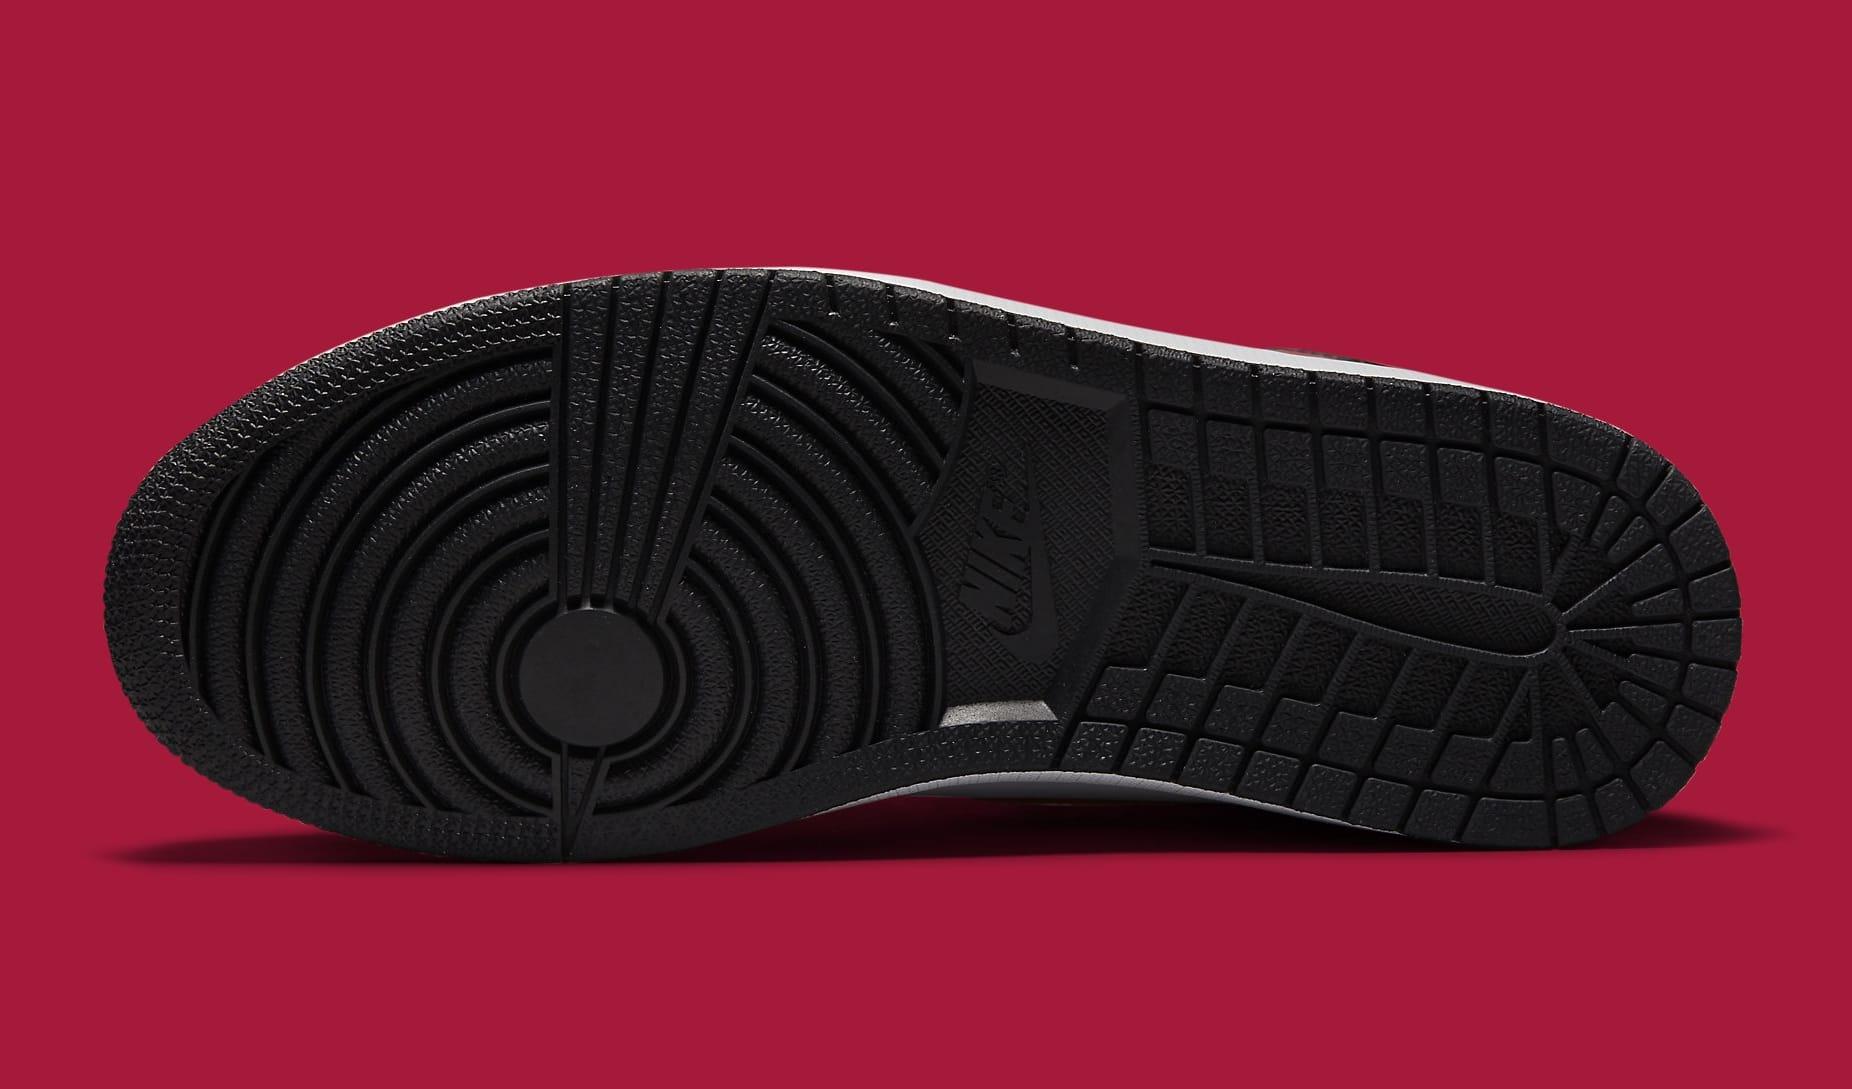 Air Jordan 1 Light Fusion Red Release Date 555088-603 Sole